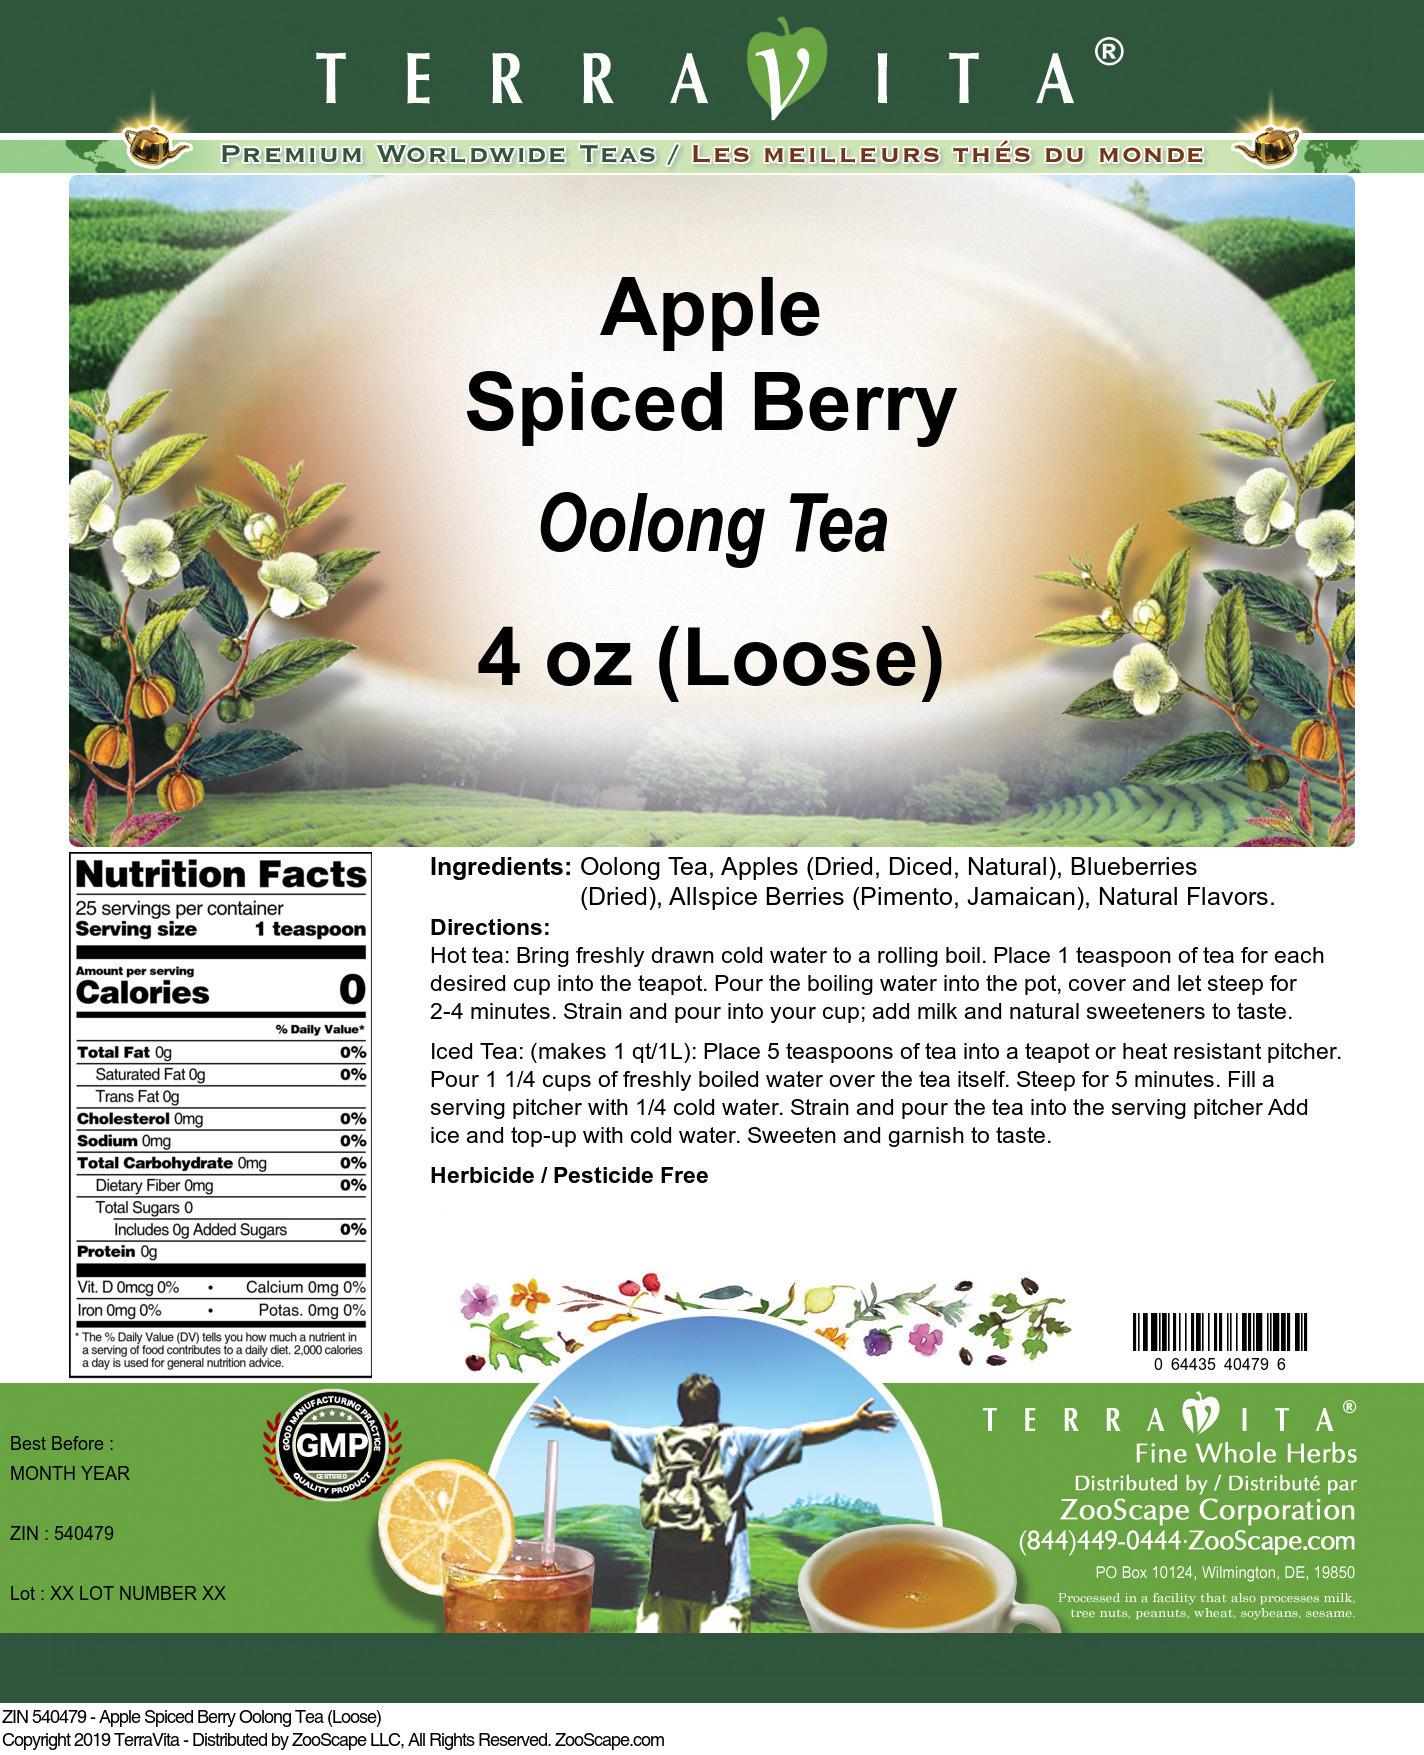 Apple Spiced Berry Oolong Tea (Loose)